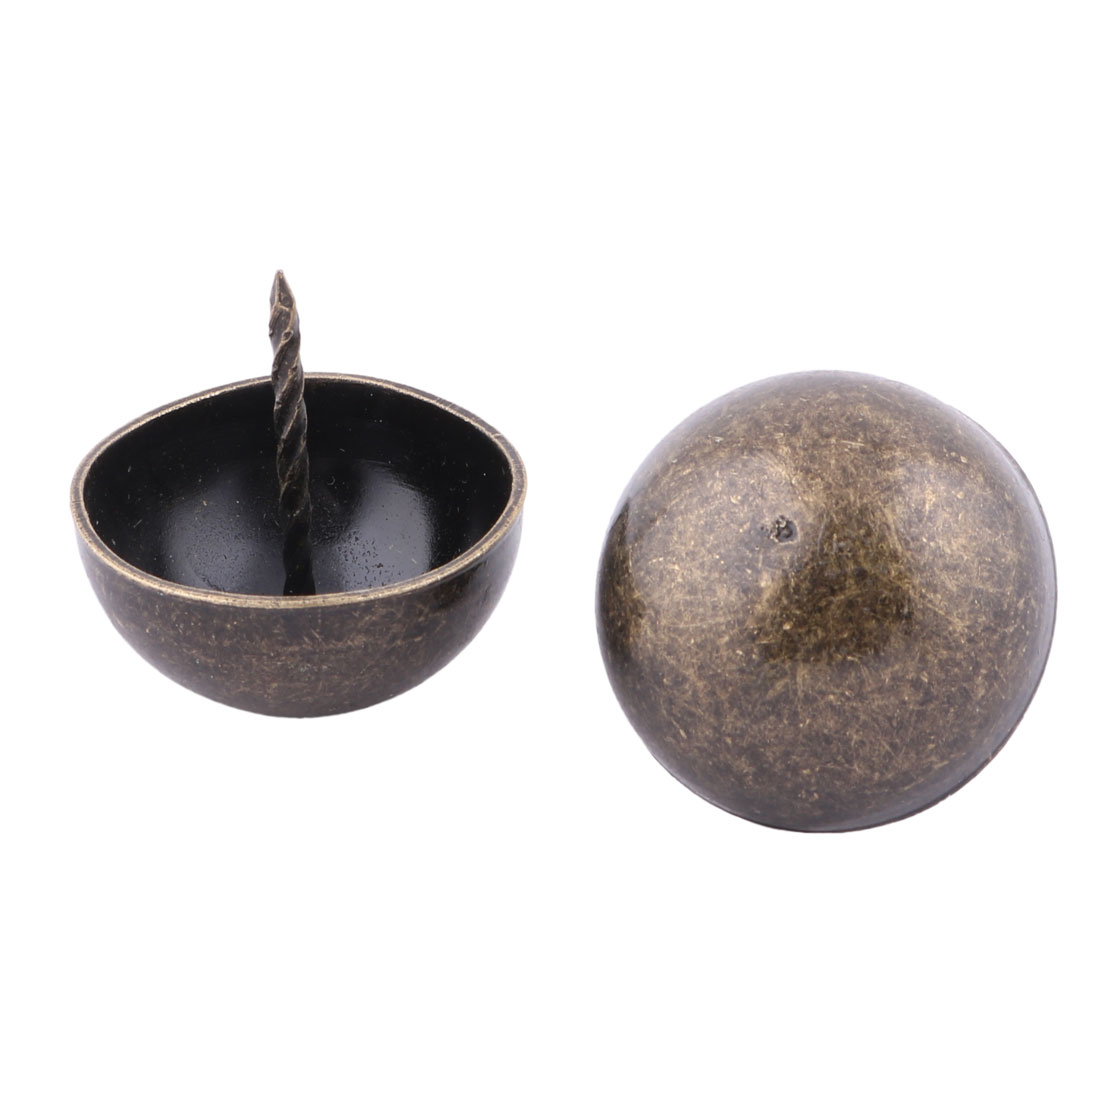 Home Furniture Metal Round Hat Upholstery Thumb Tack Nail Pushpin Bronze Tone 4 x 4.1cm 2pcs